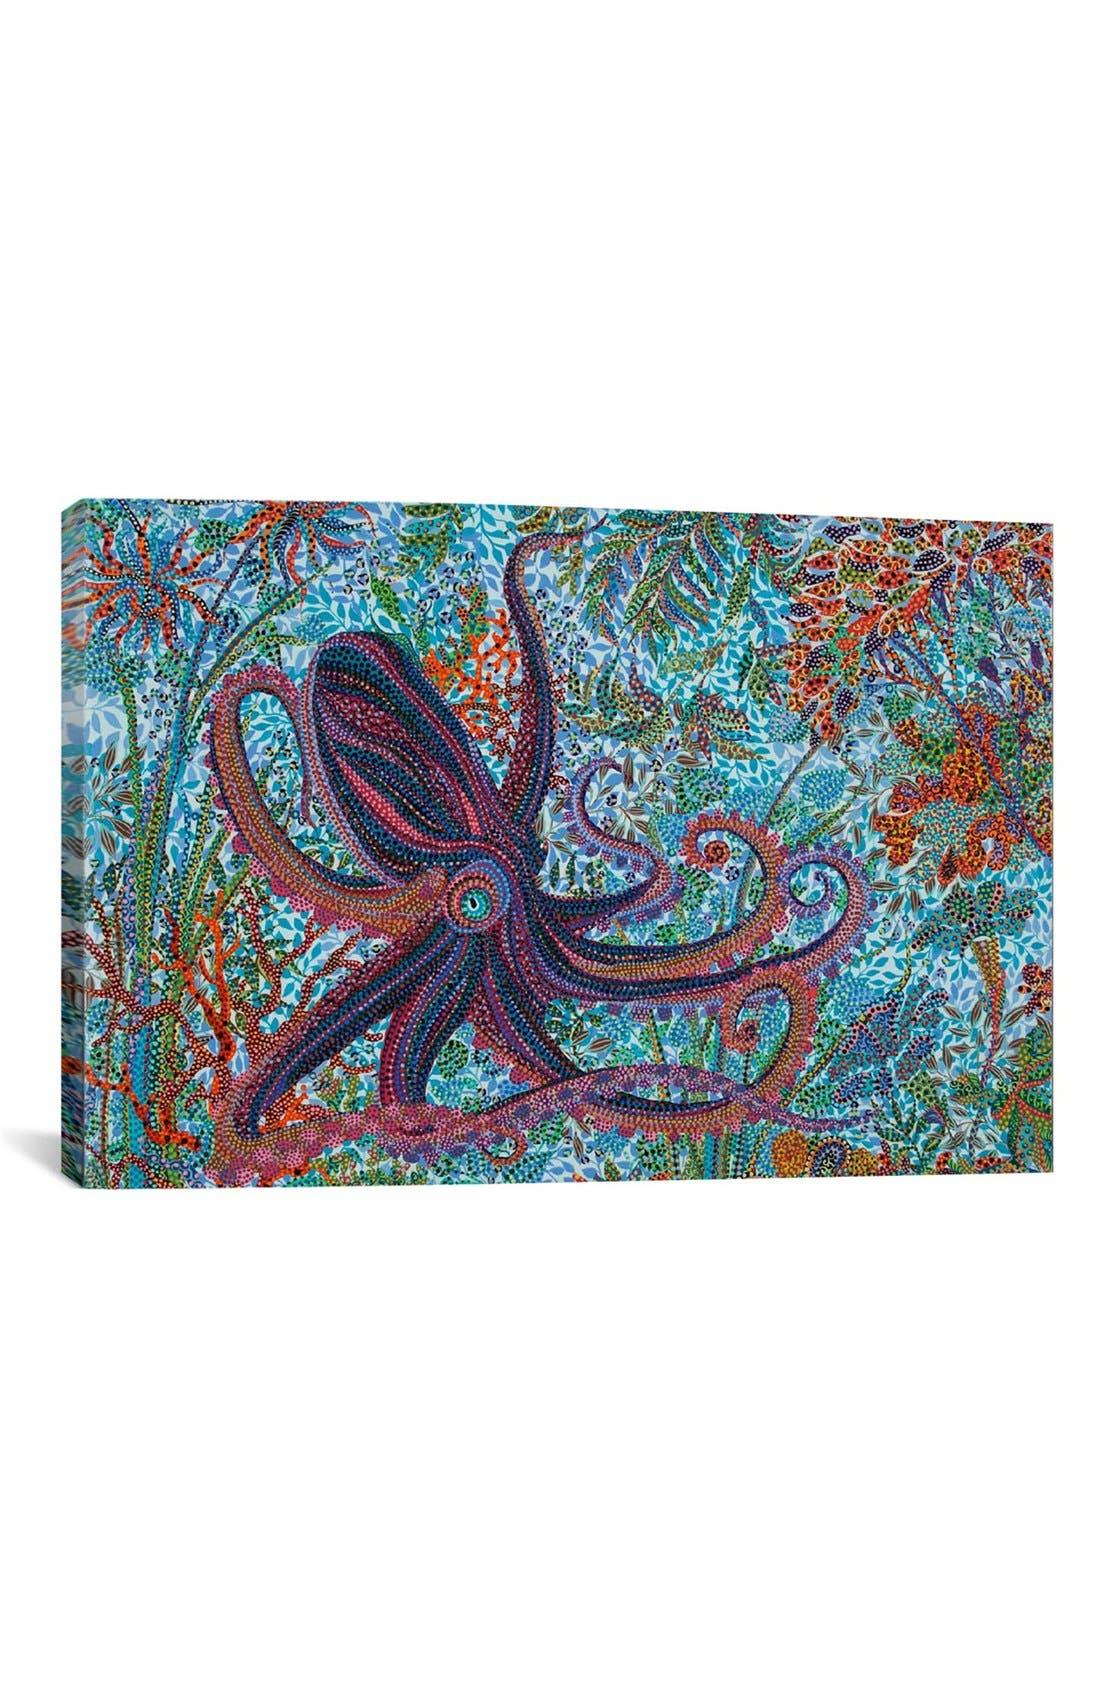 'Octopus - Ebova' Giclée Print Canvas Art,                             Main thumbnail 1, color,